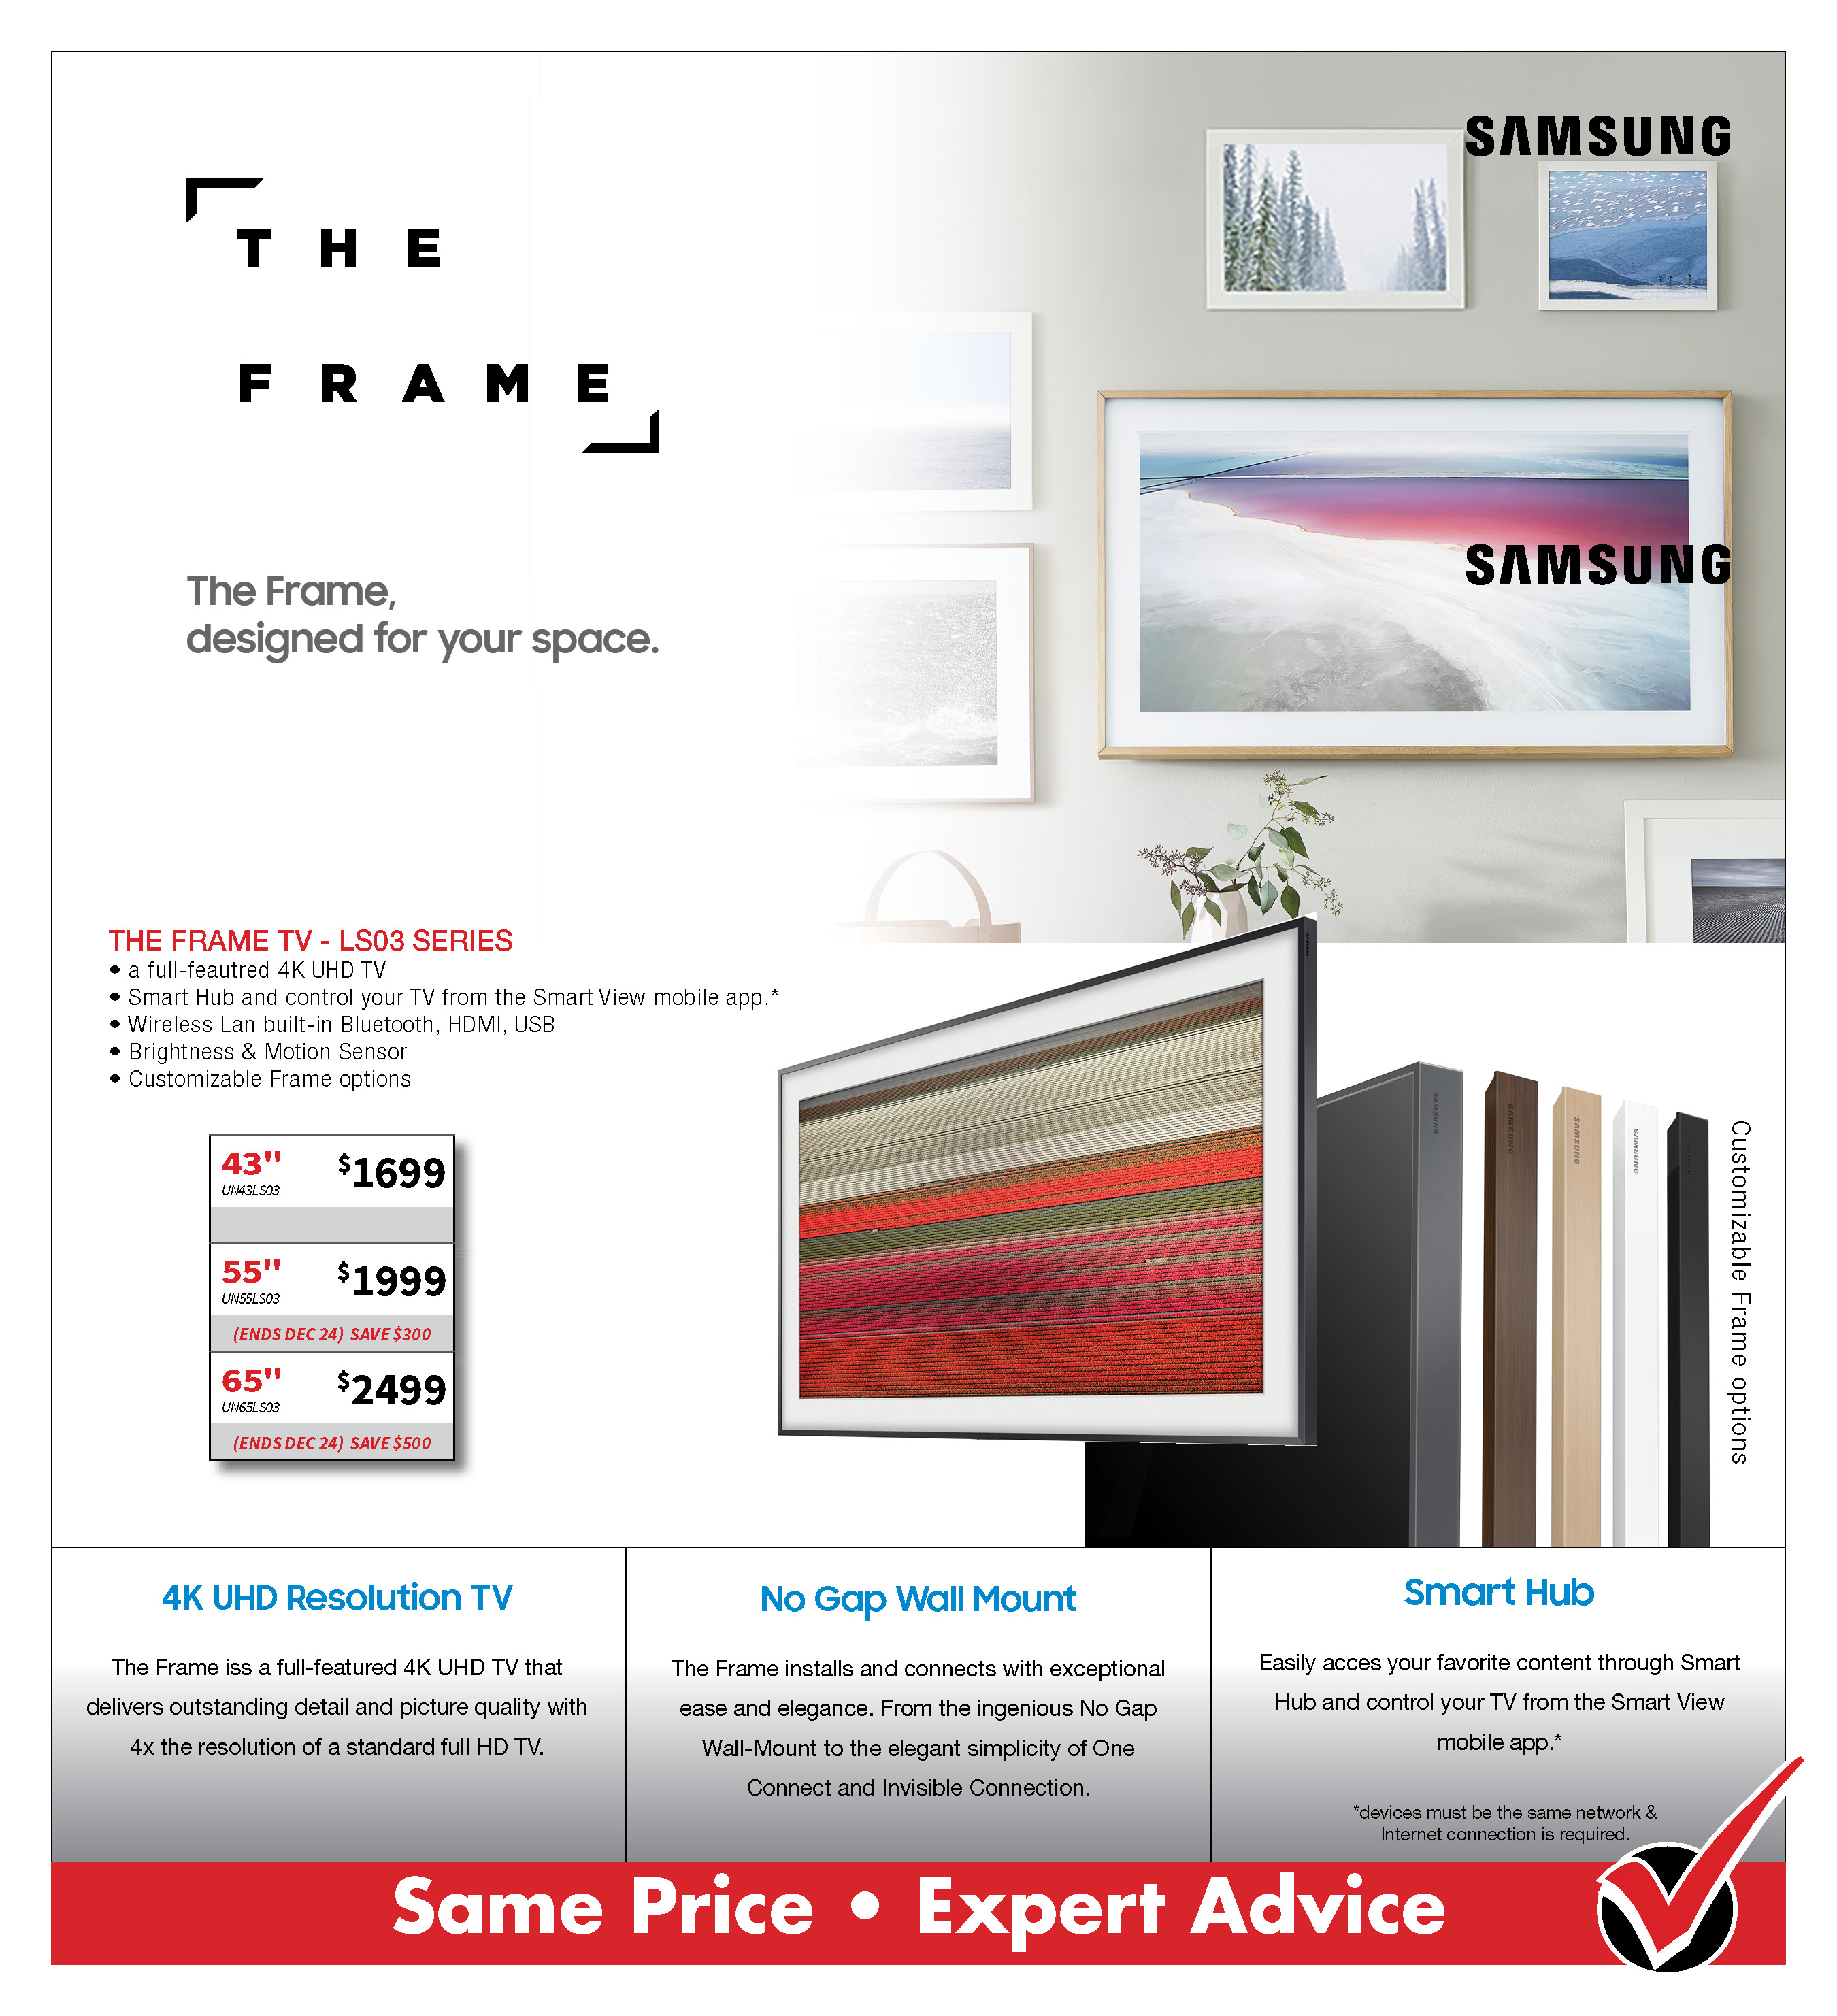 SAMSUNG N5300 TV